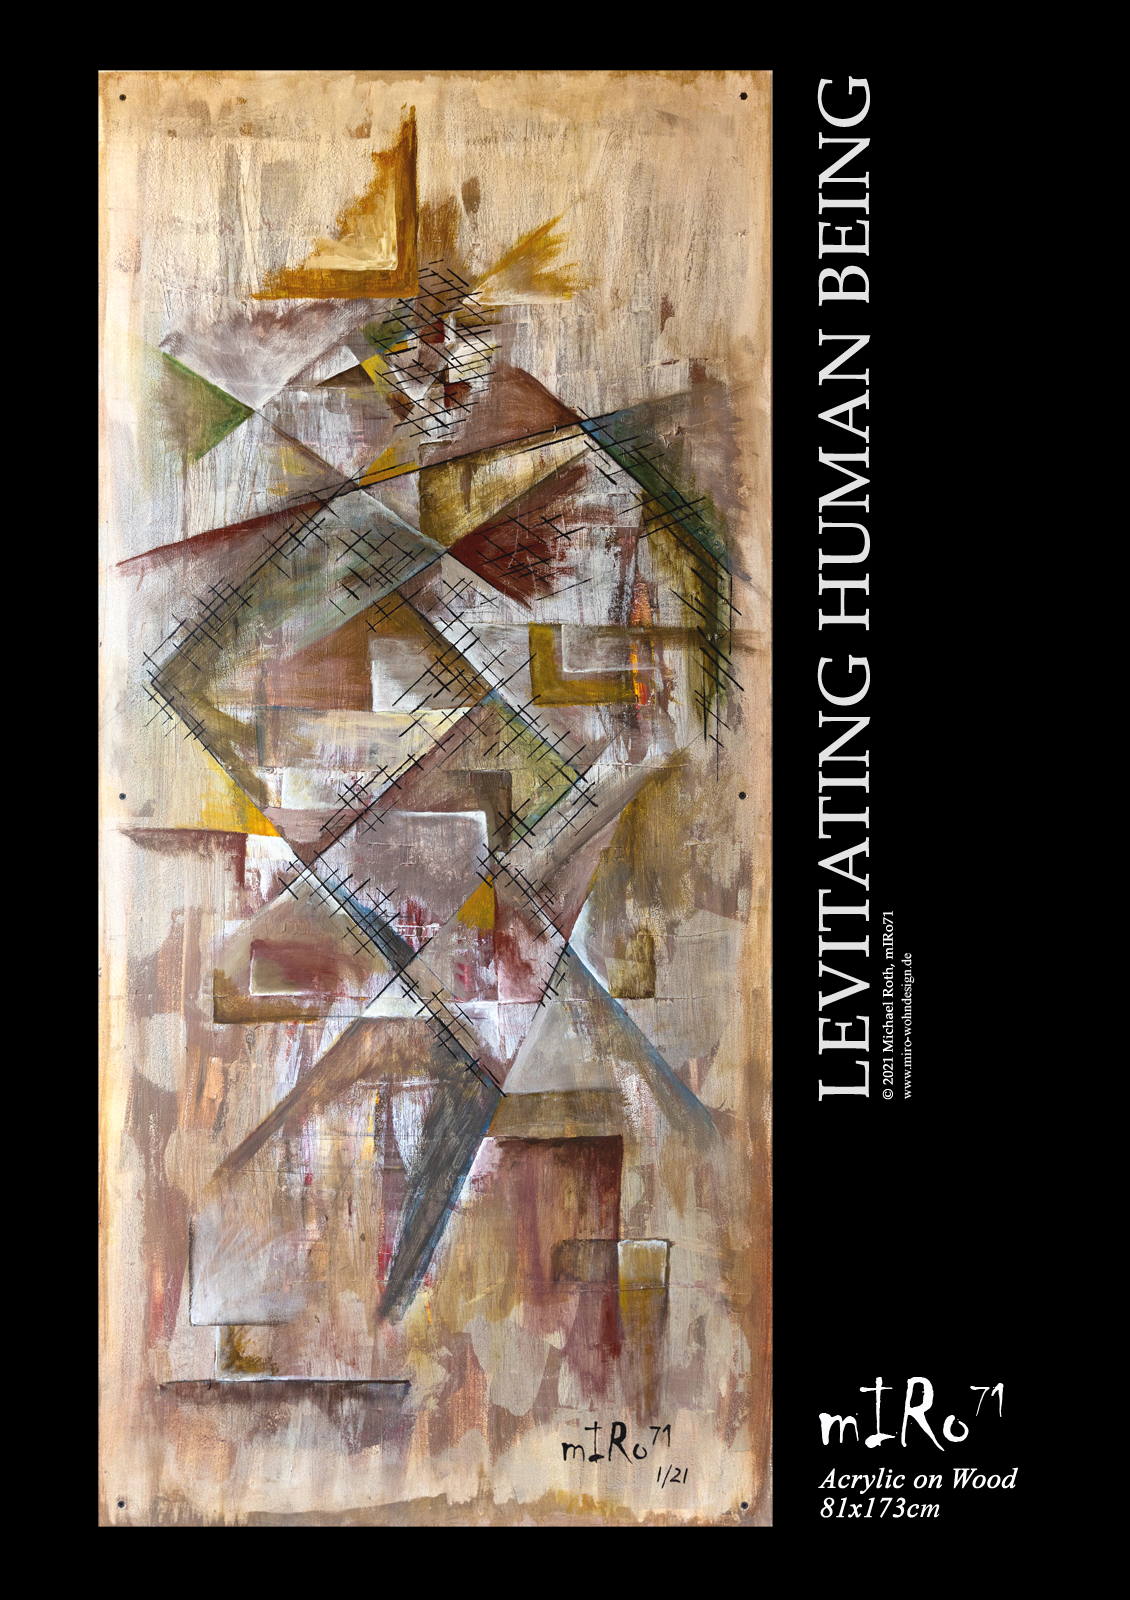 LEVITATING HUMAN BEING, Acrylic Painting on Wood, Acryl Gemälde, mIRo71